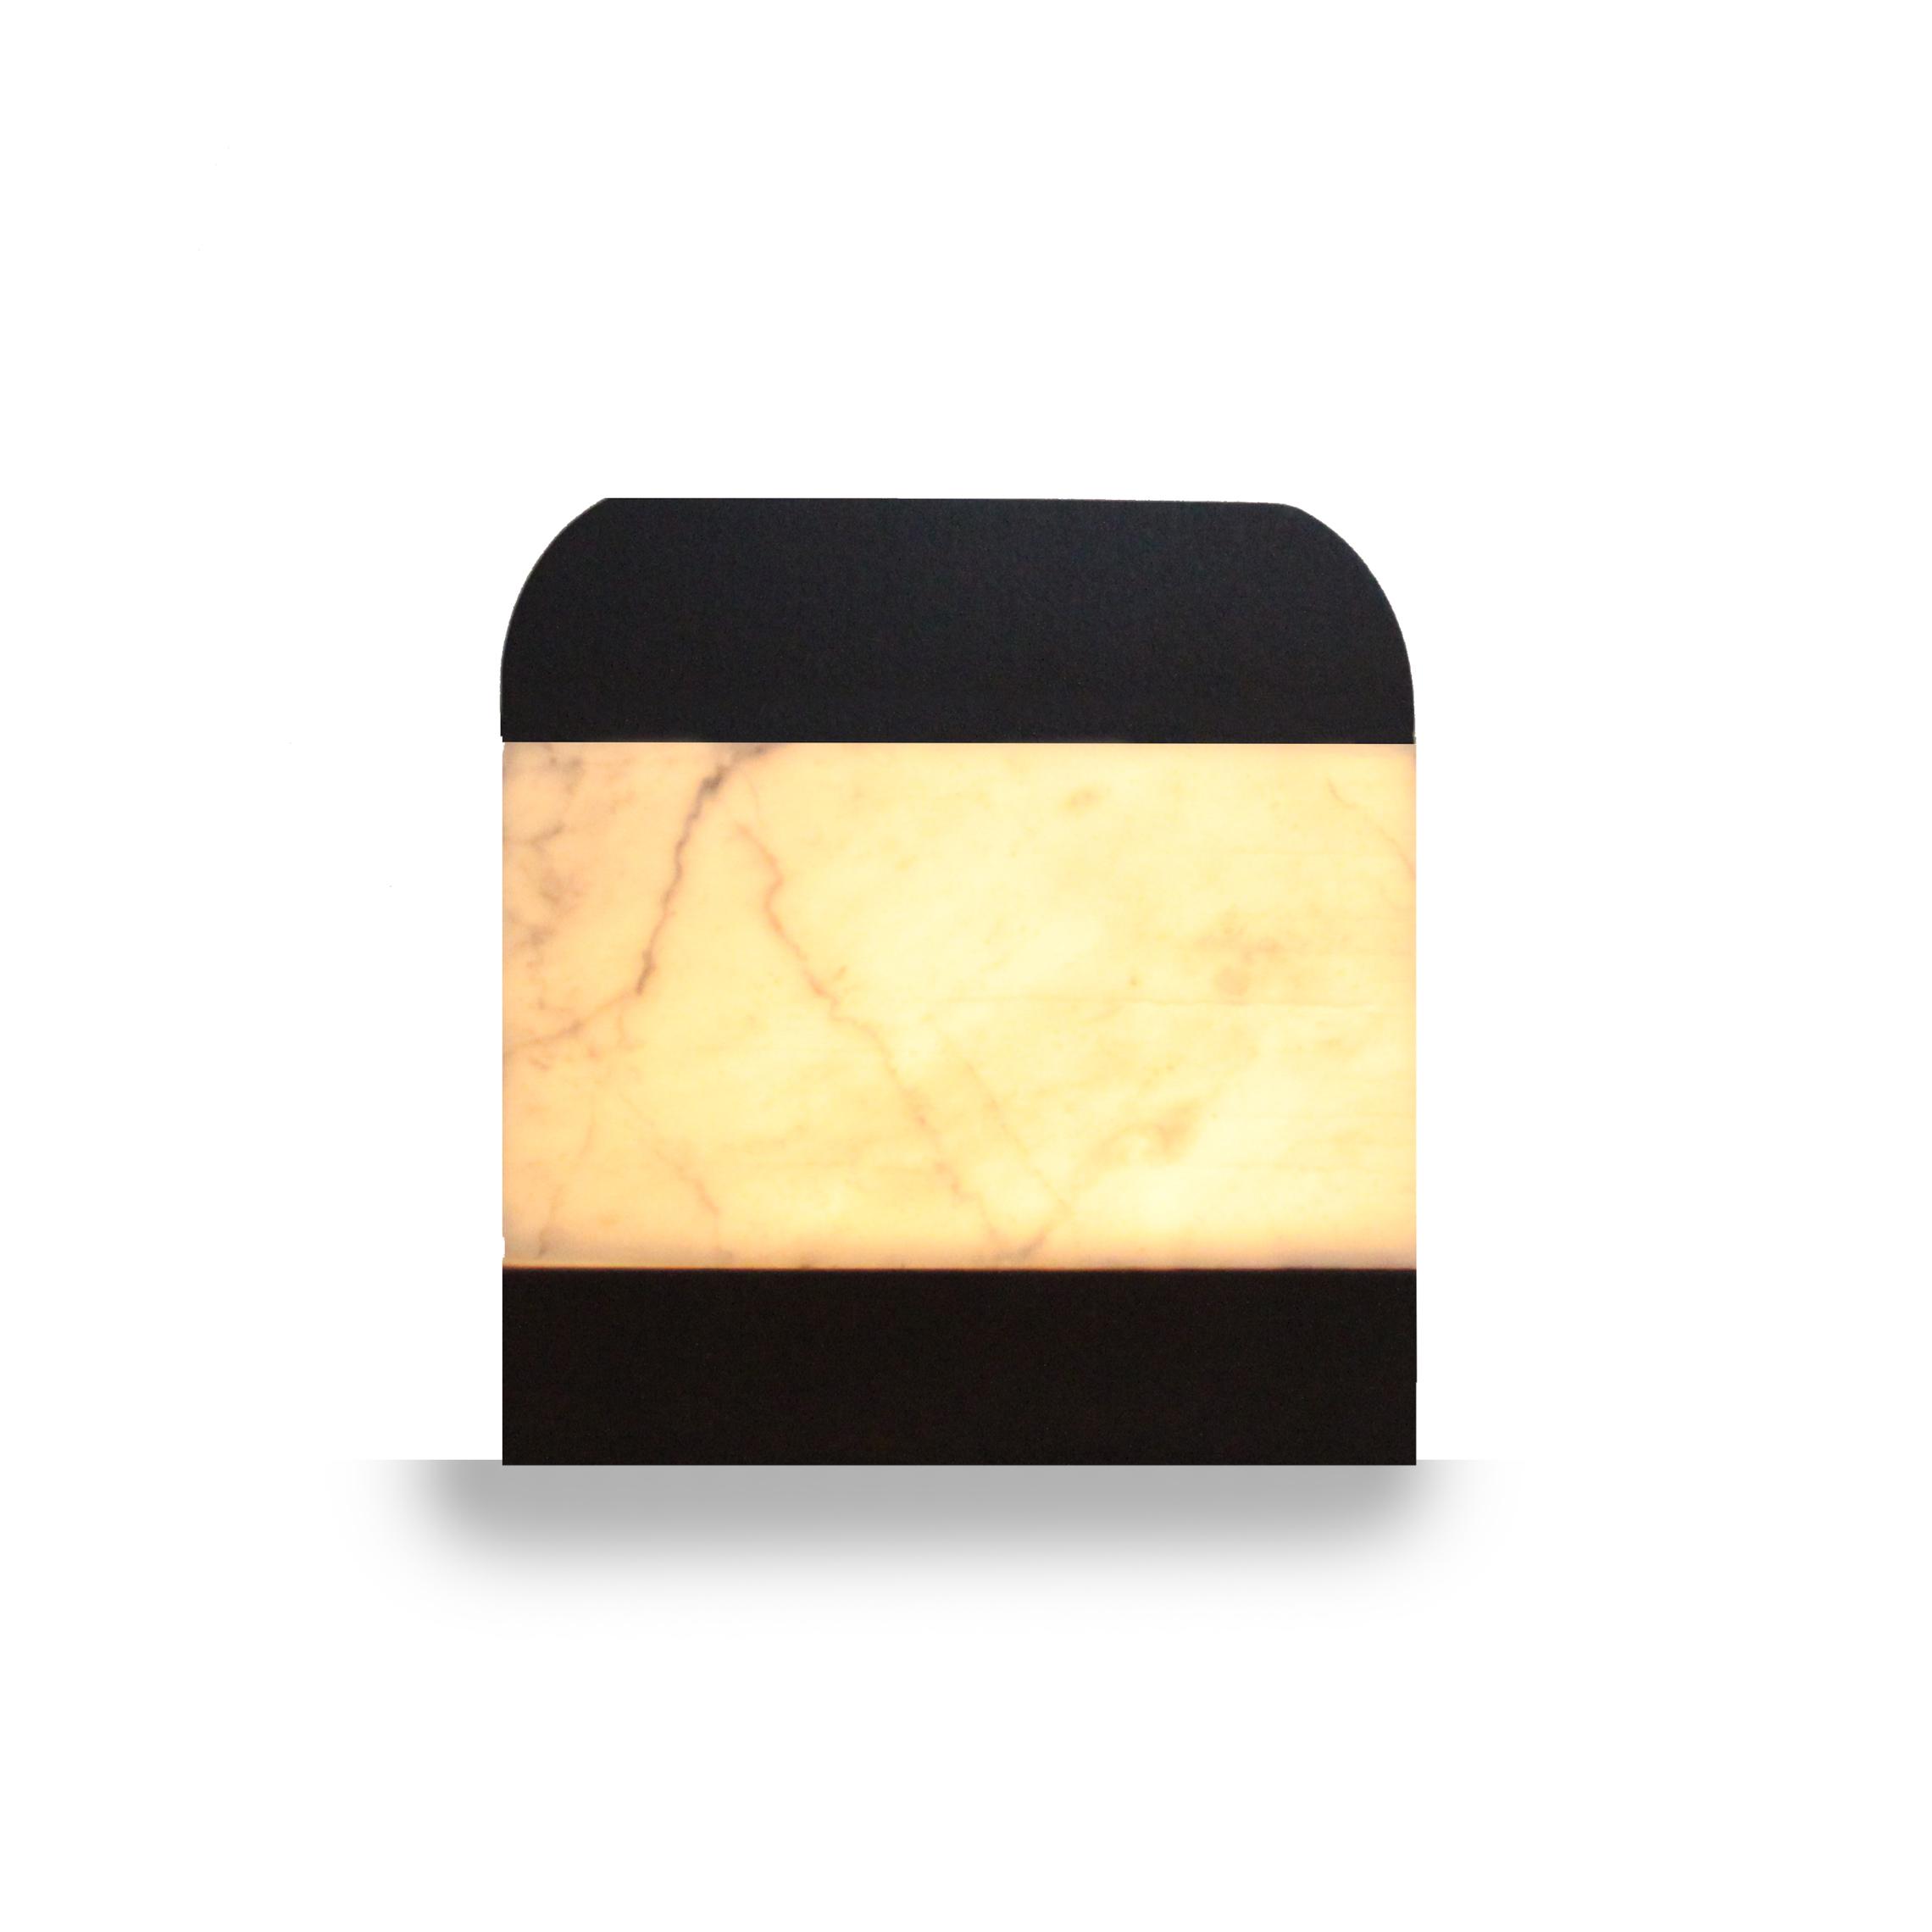 iVar Cube